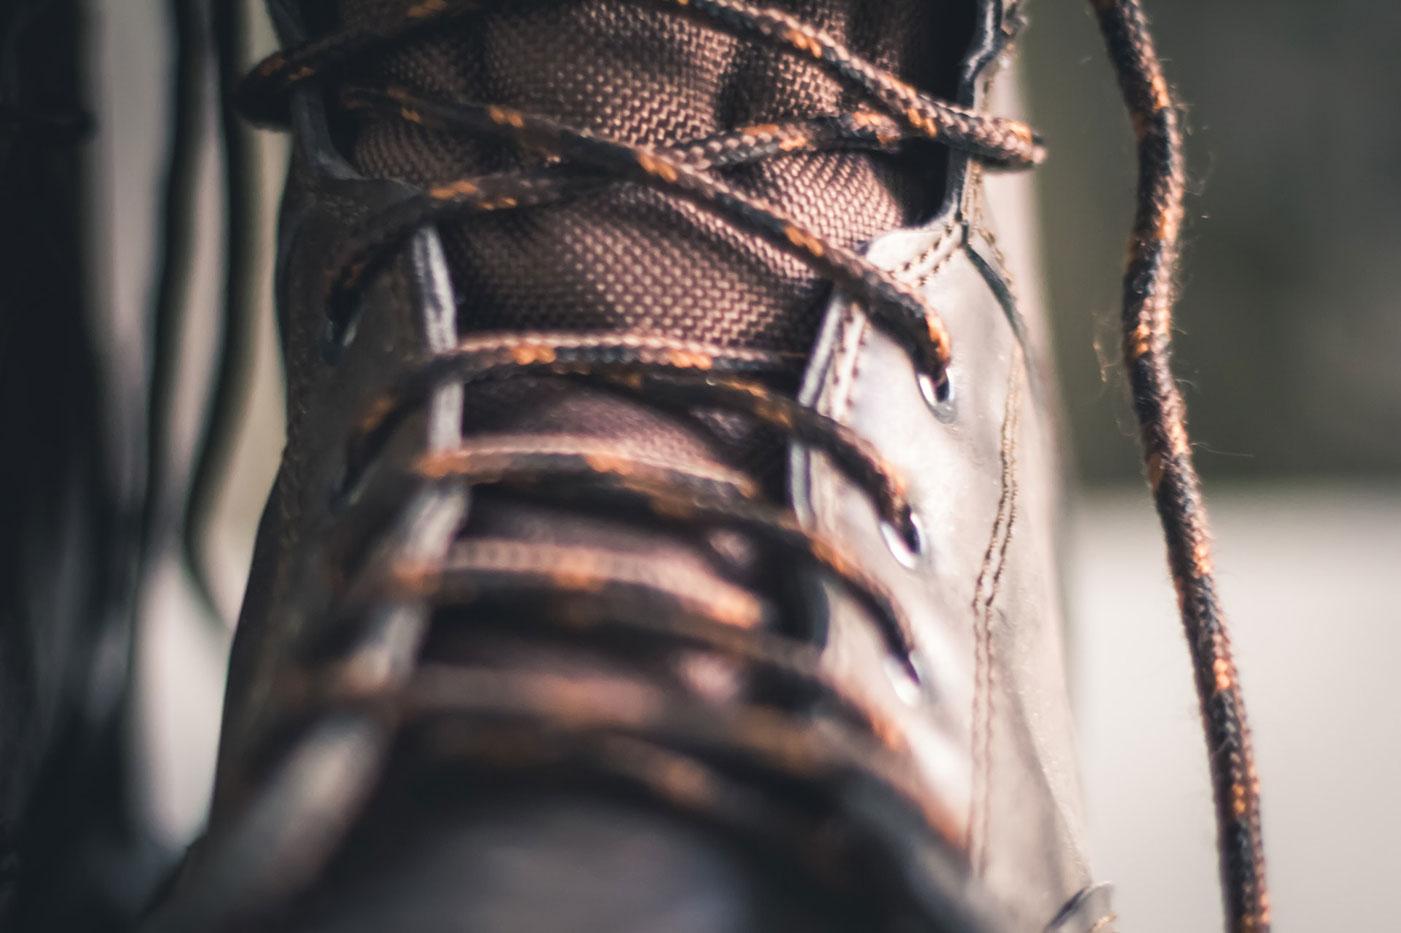 closeup of a boot